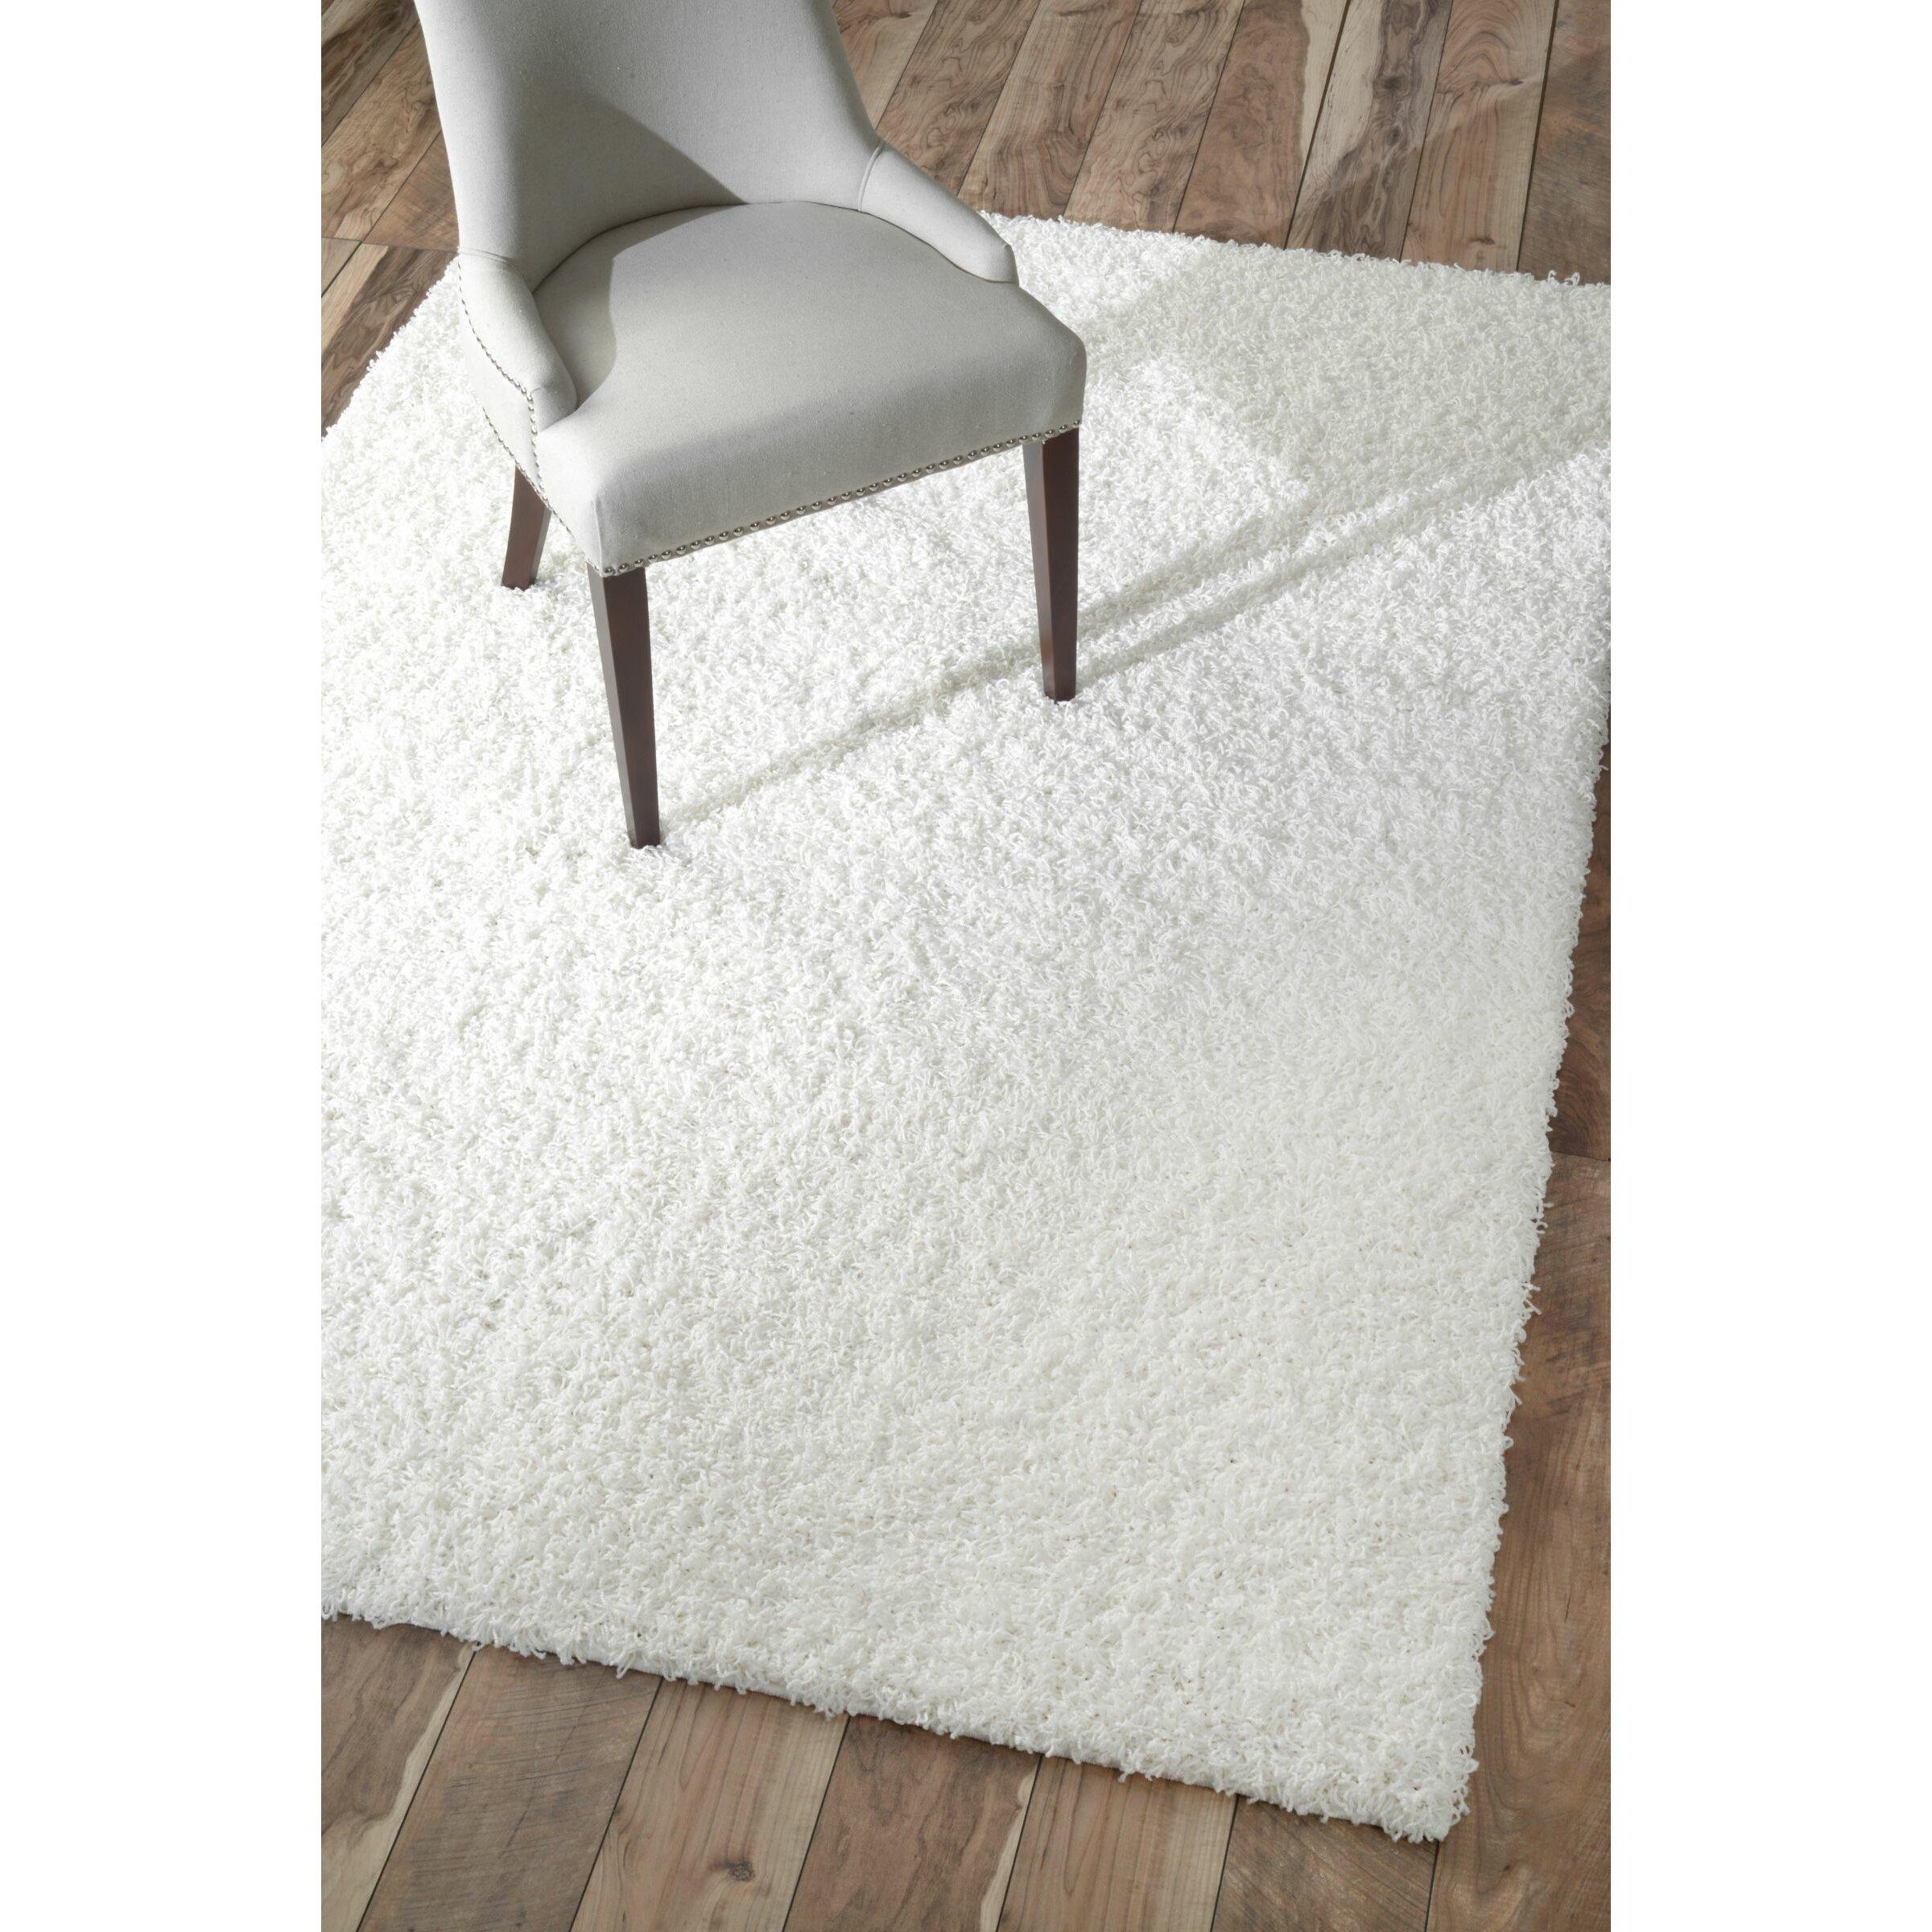 White Carpet Bedroom Rug On Carpet Bedroom Wood Bedroom Design Ideas Modern Bedroom Art: NuLOOM Serano Shag White Area Rug & Reviews